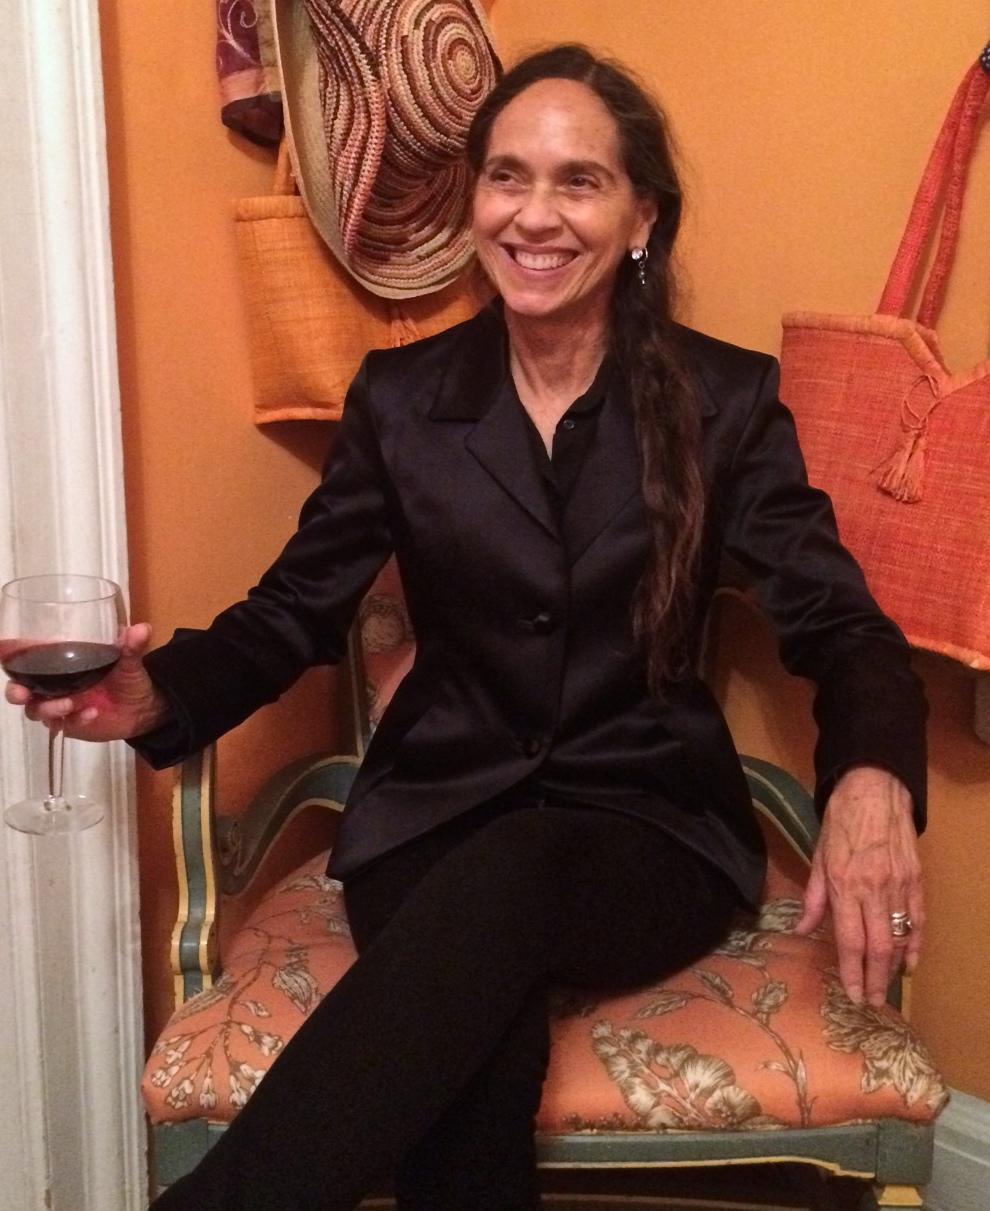 Artist Jill Levine in silk satin jacket